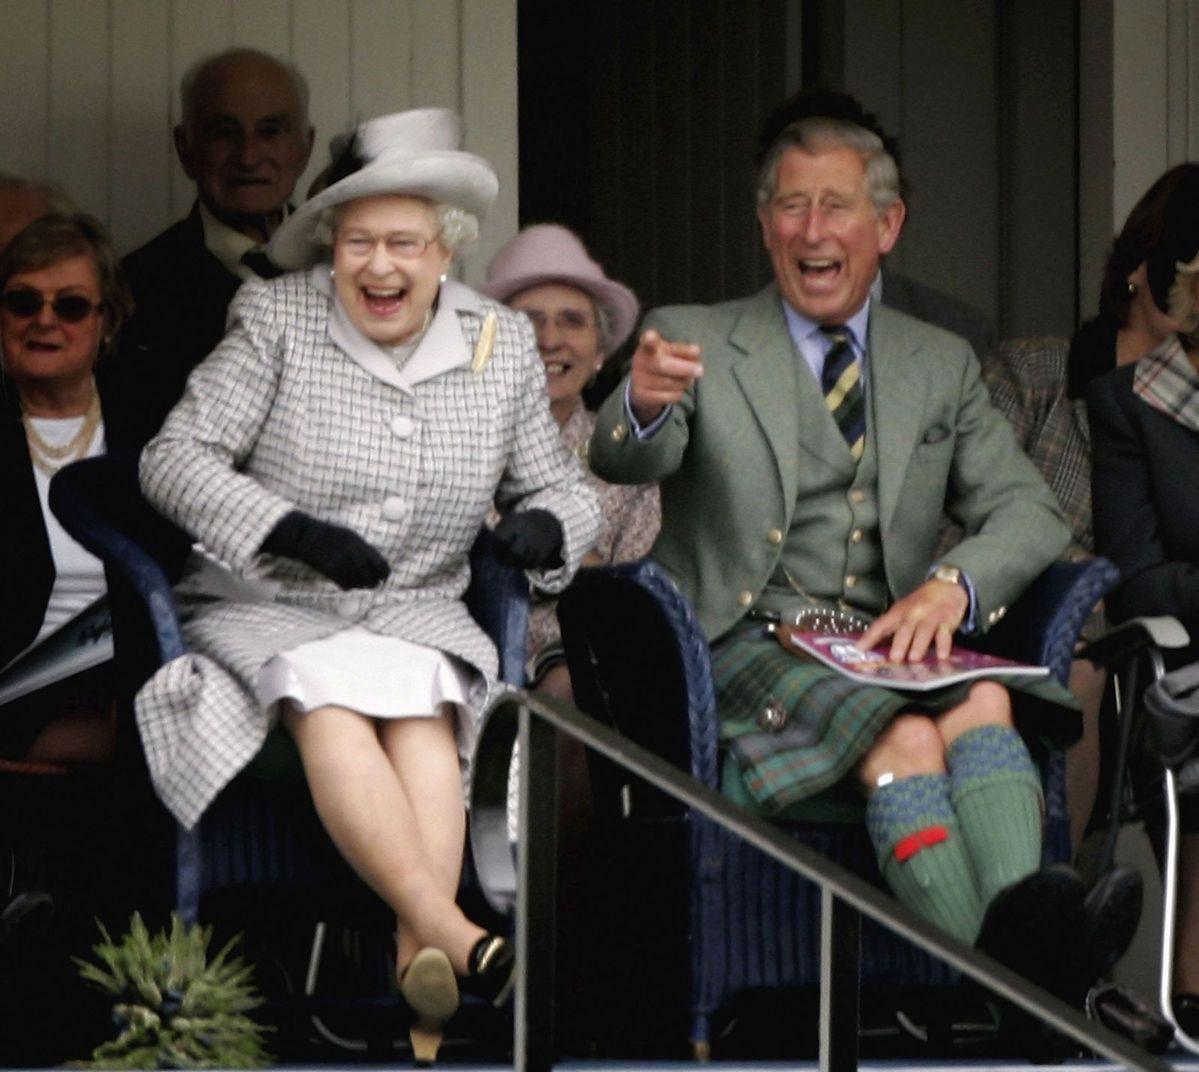 Pin By Foxavior Scaramonga On Queen Elizabeth Ii S Court Queen Elizabeth Memes England Funny British Royal Family